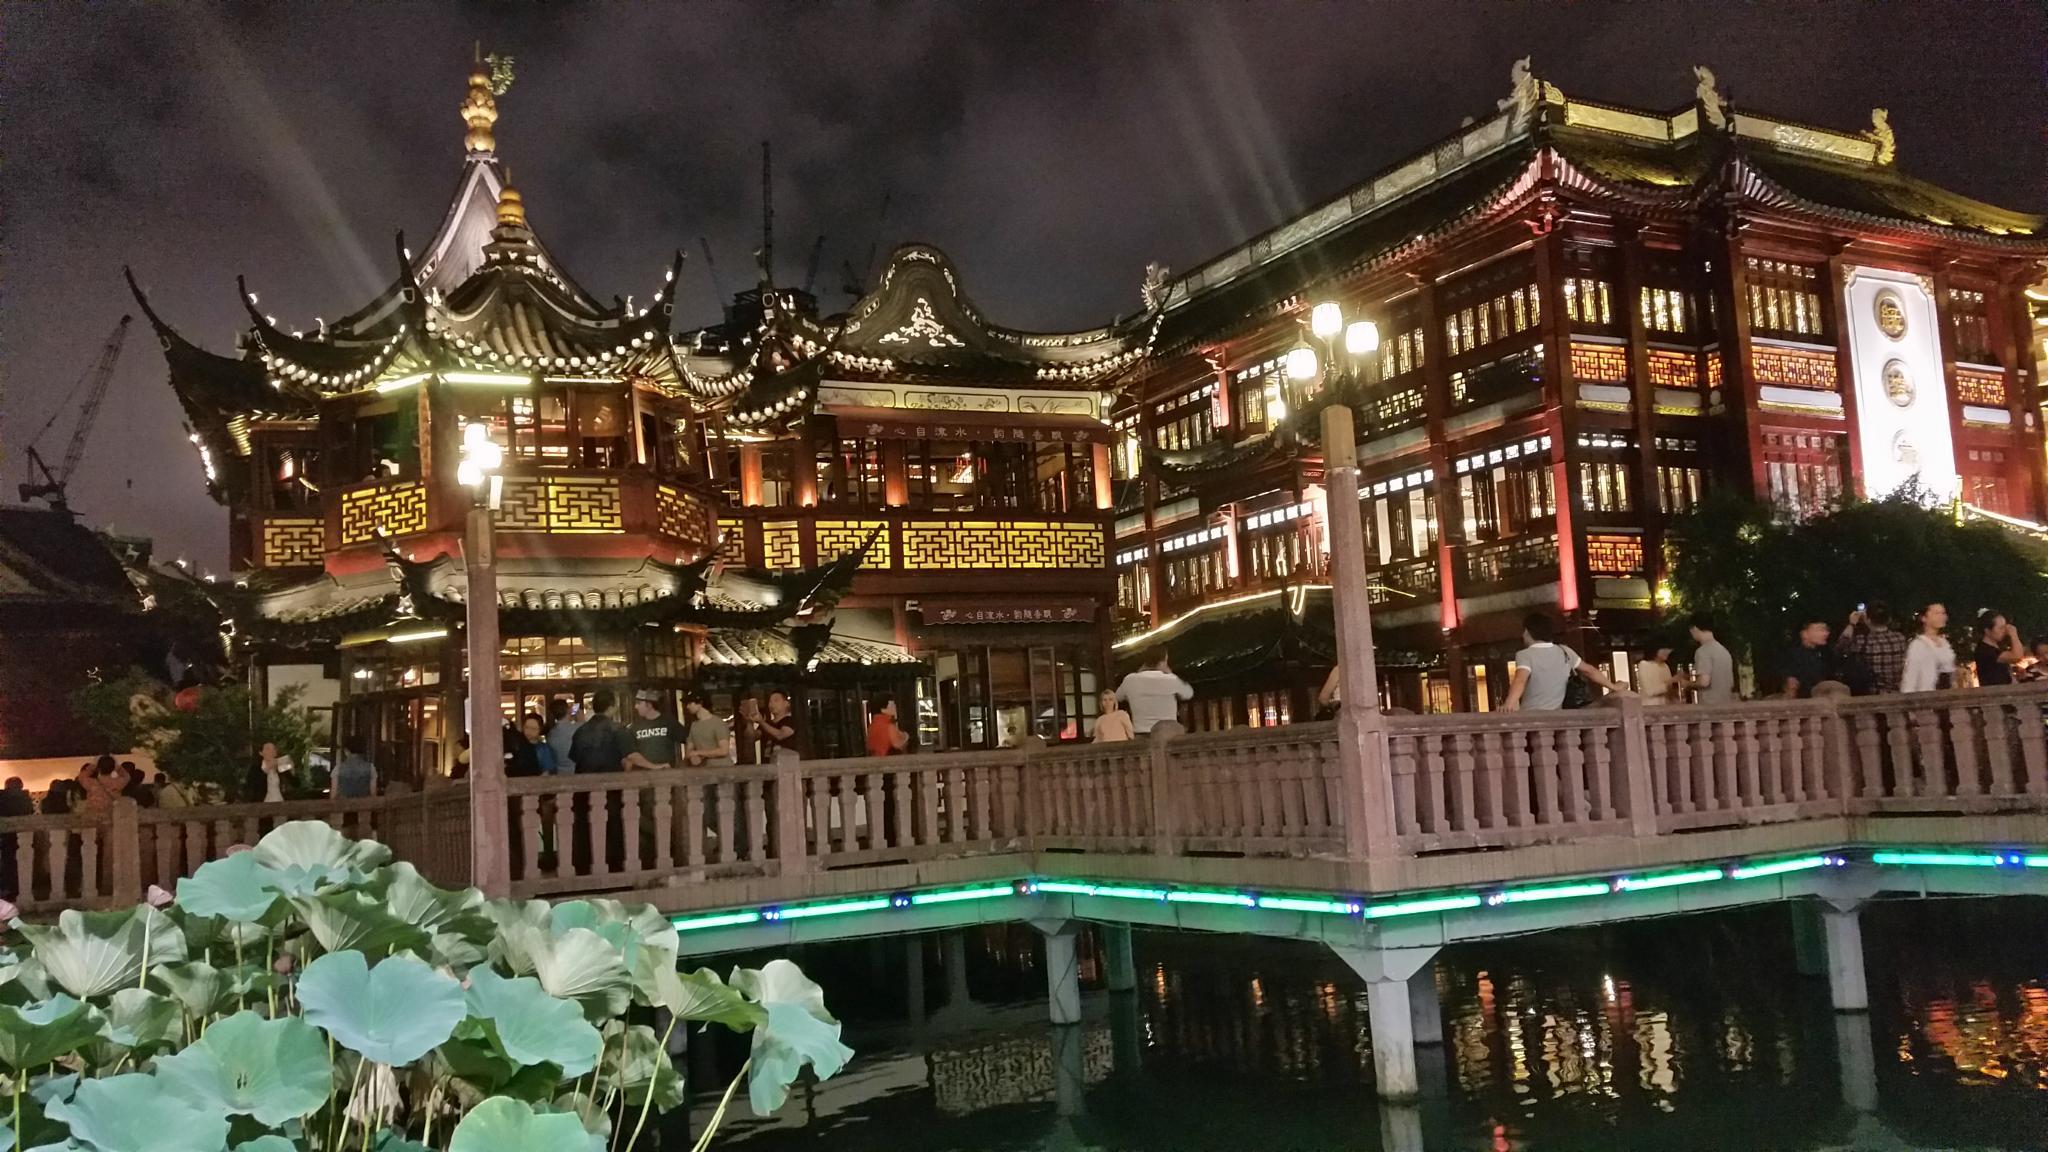 Shanghai Old Town by Frank Bollmann